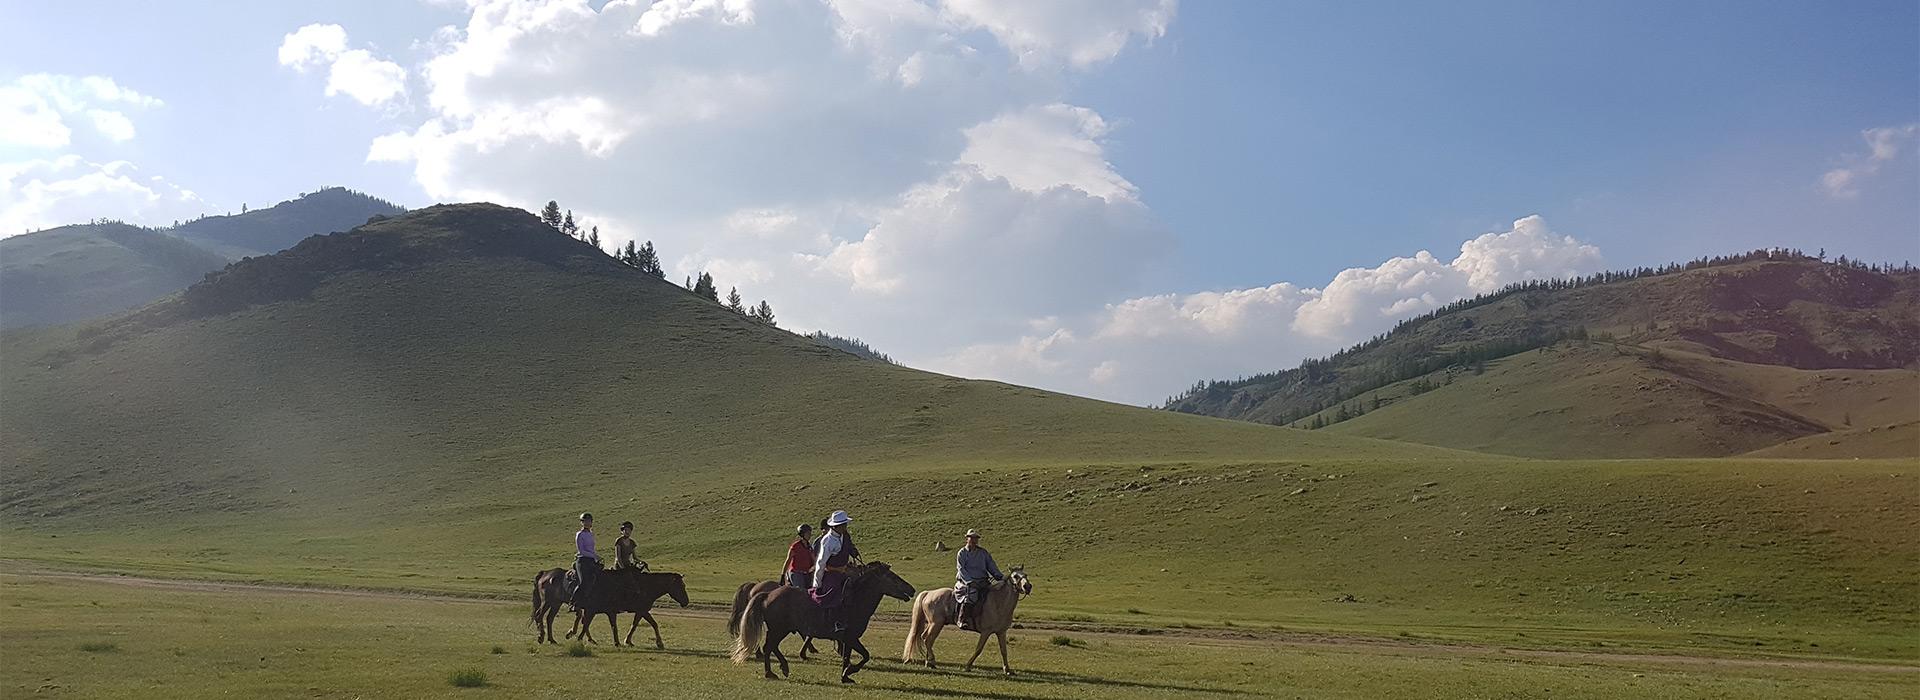 horseback-journeys-mongolia